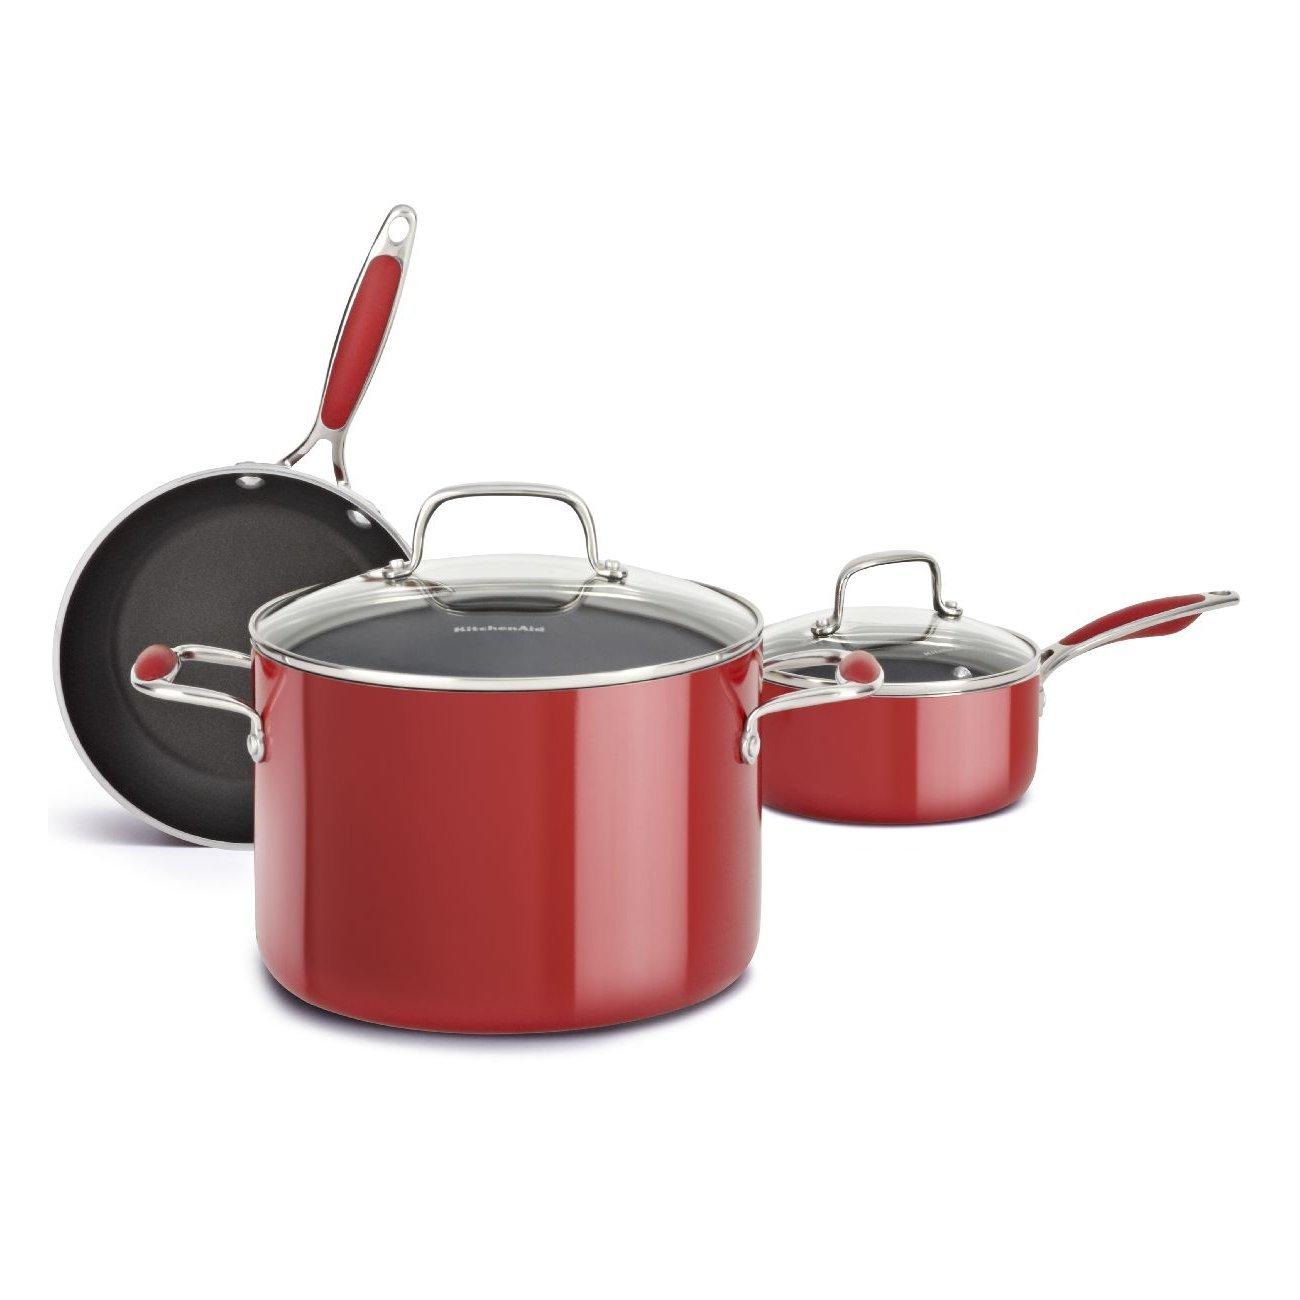 KitchenAid KCAS05AER Aluminum Nonstick 5-Piece Set Cookware - Empire Red by KitchenAid: Amazon.es: Hogar